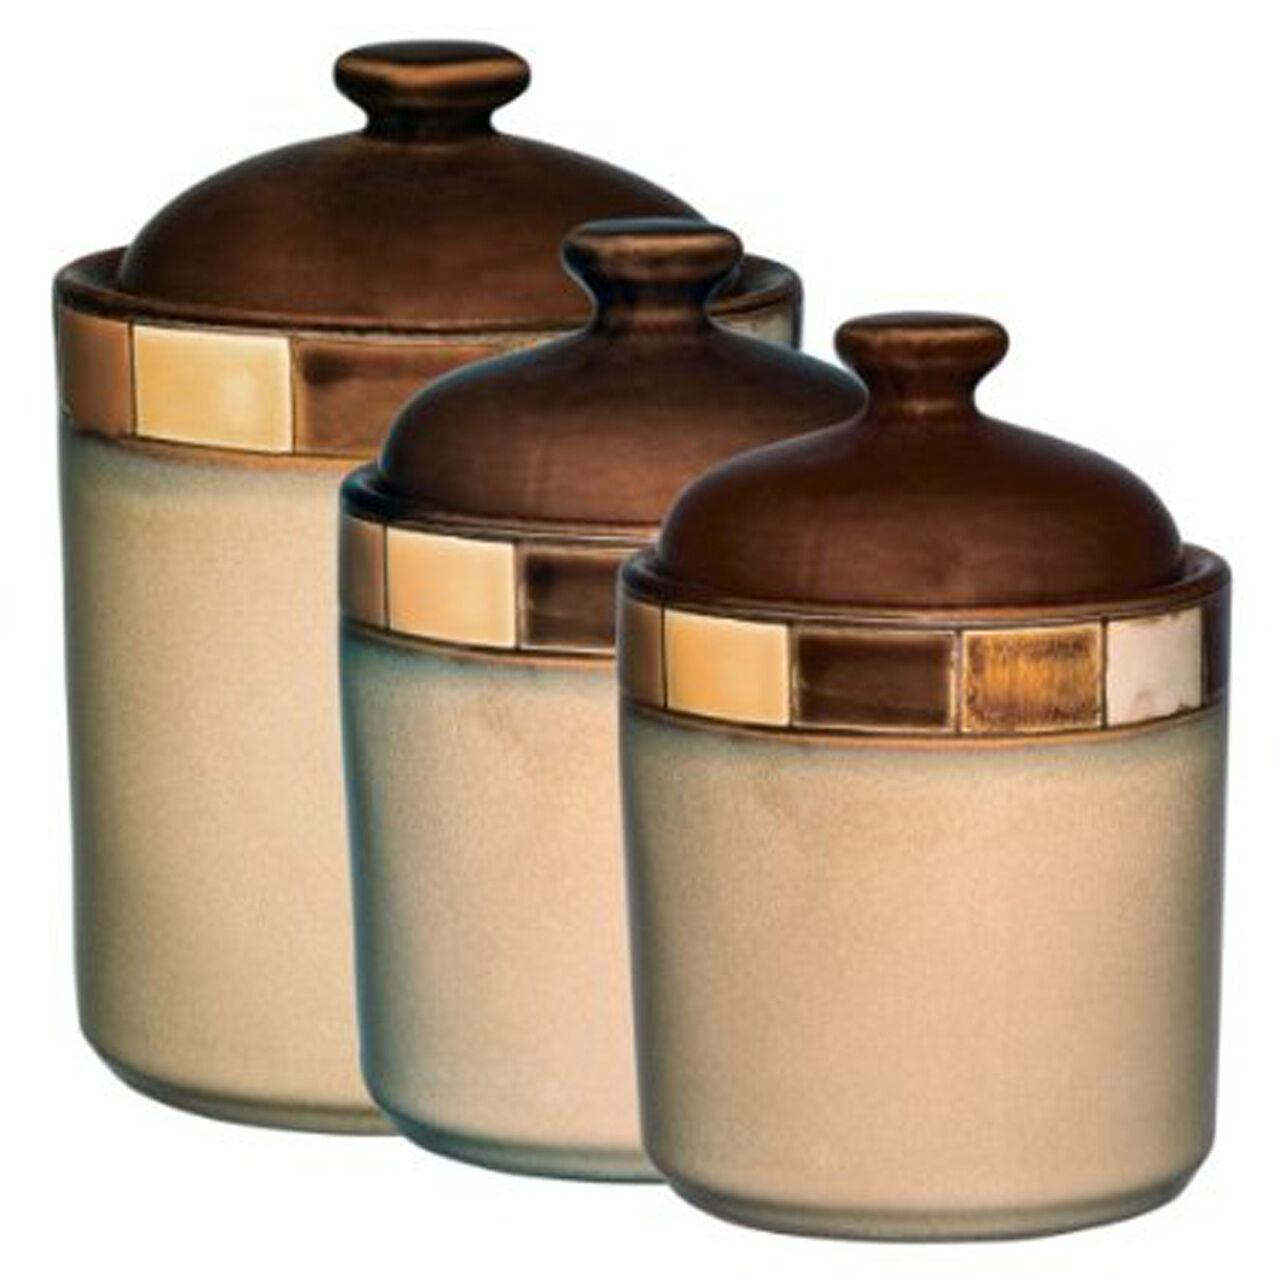 stunning Vintage Canister Sets Ebay Part - 10: Gibson Ceramic Casa Estebana 3 PC Canister Set